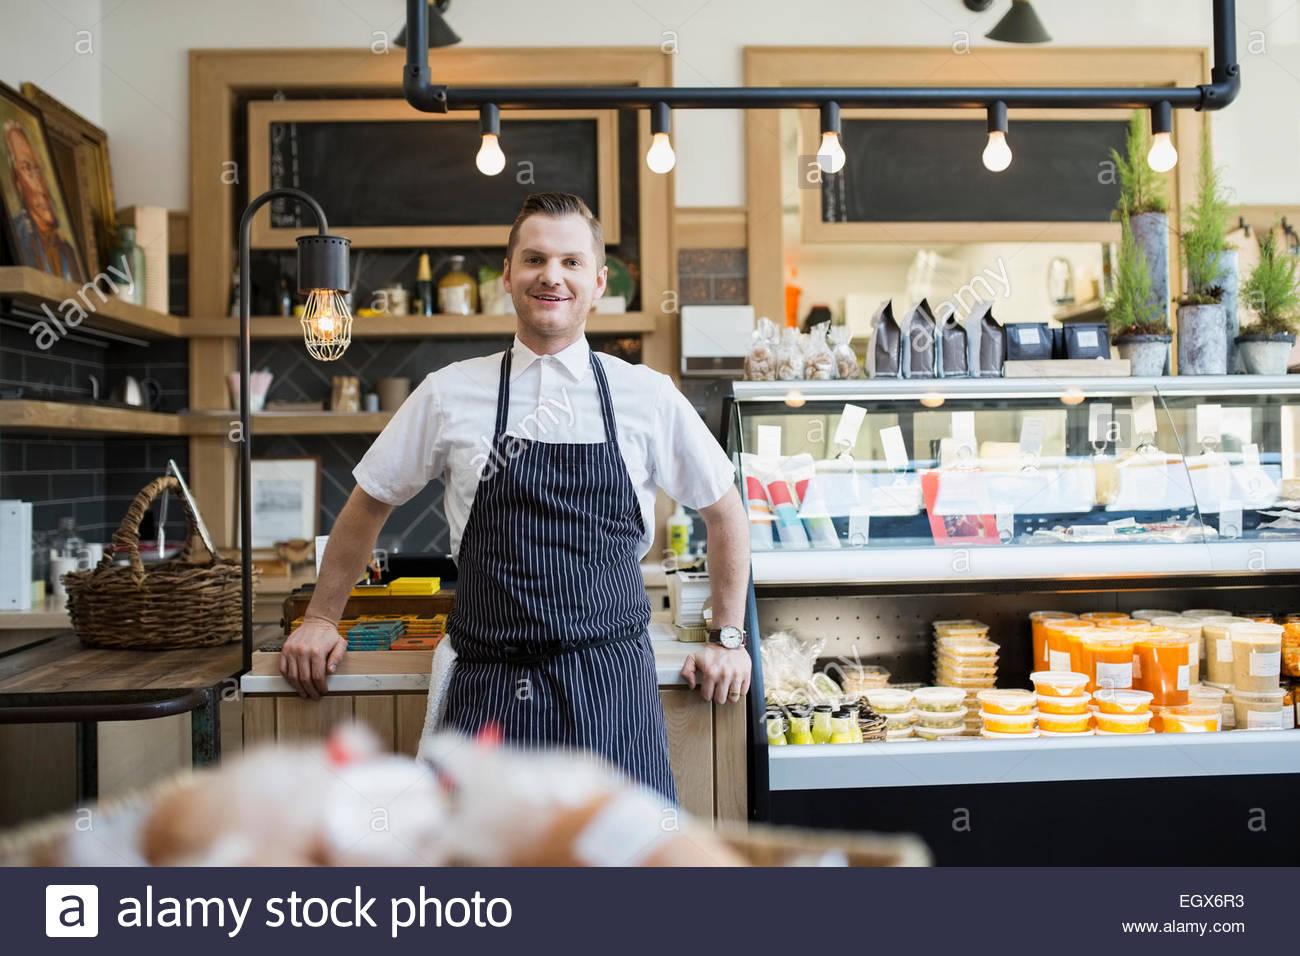 Portrait of confident market owner wearing apron - Stock Image